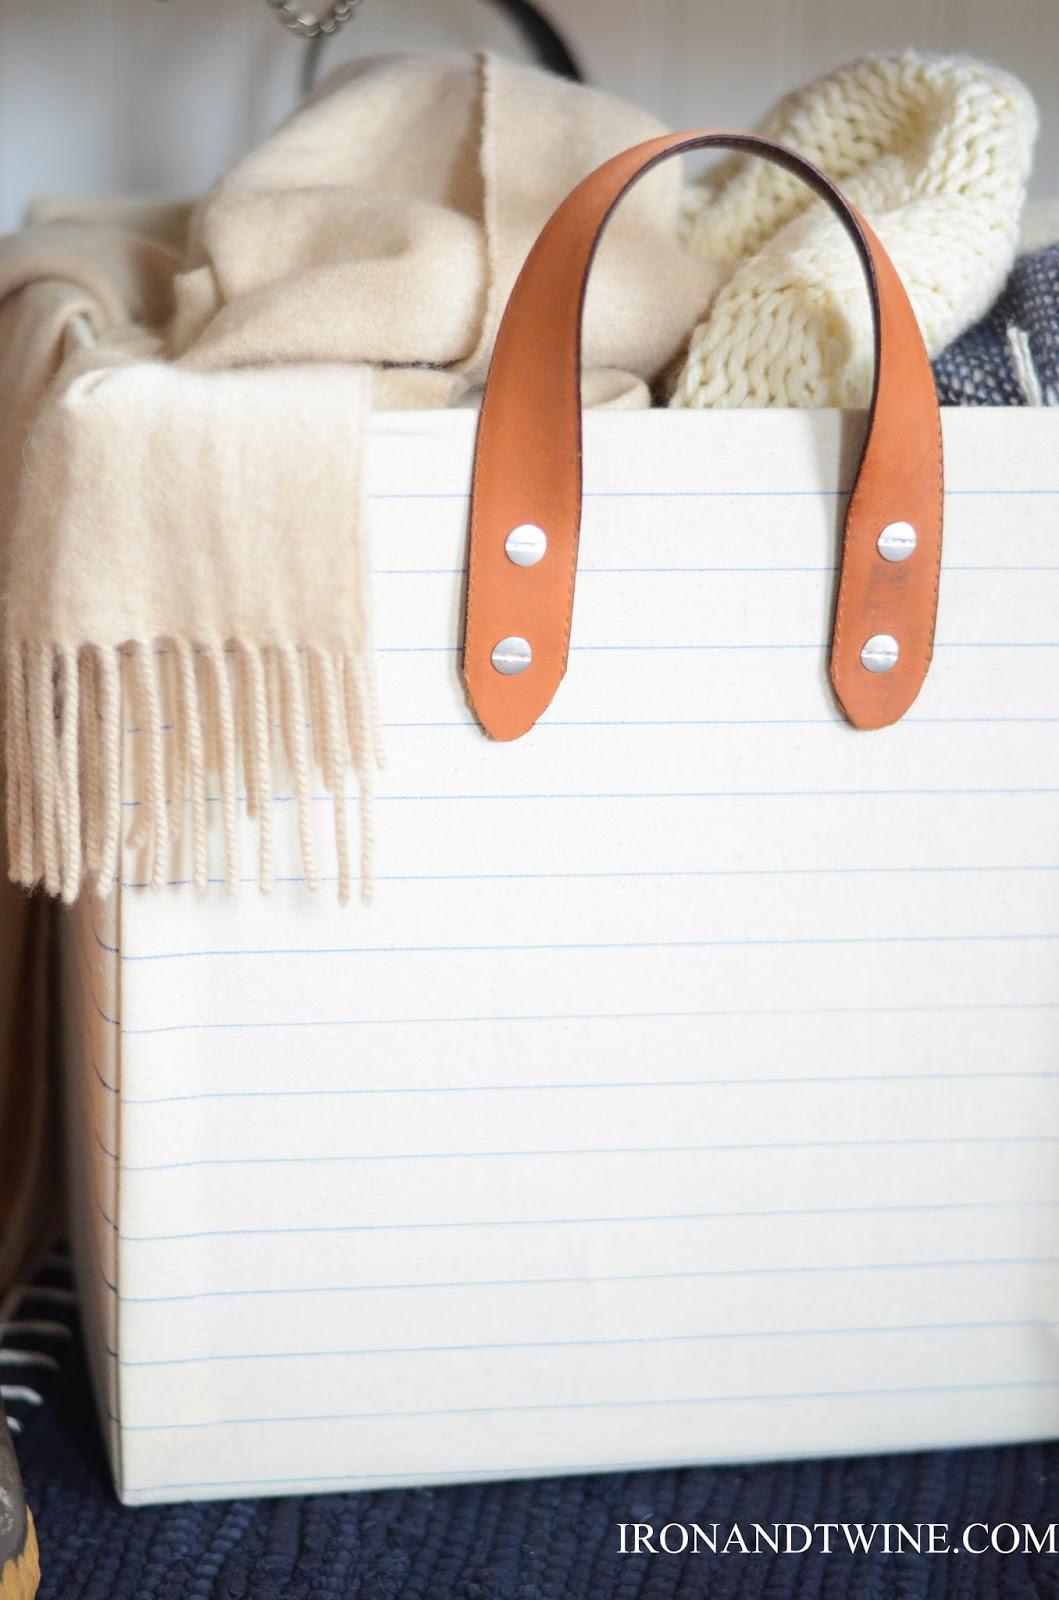 DIY+Belt+Handled+Box,+DIY+fabric+covered+box,+Iron+and+Twine+(3).jpg